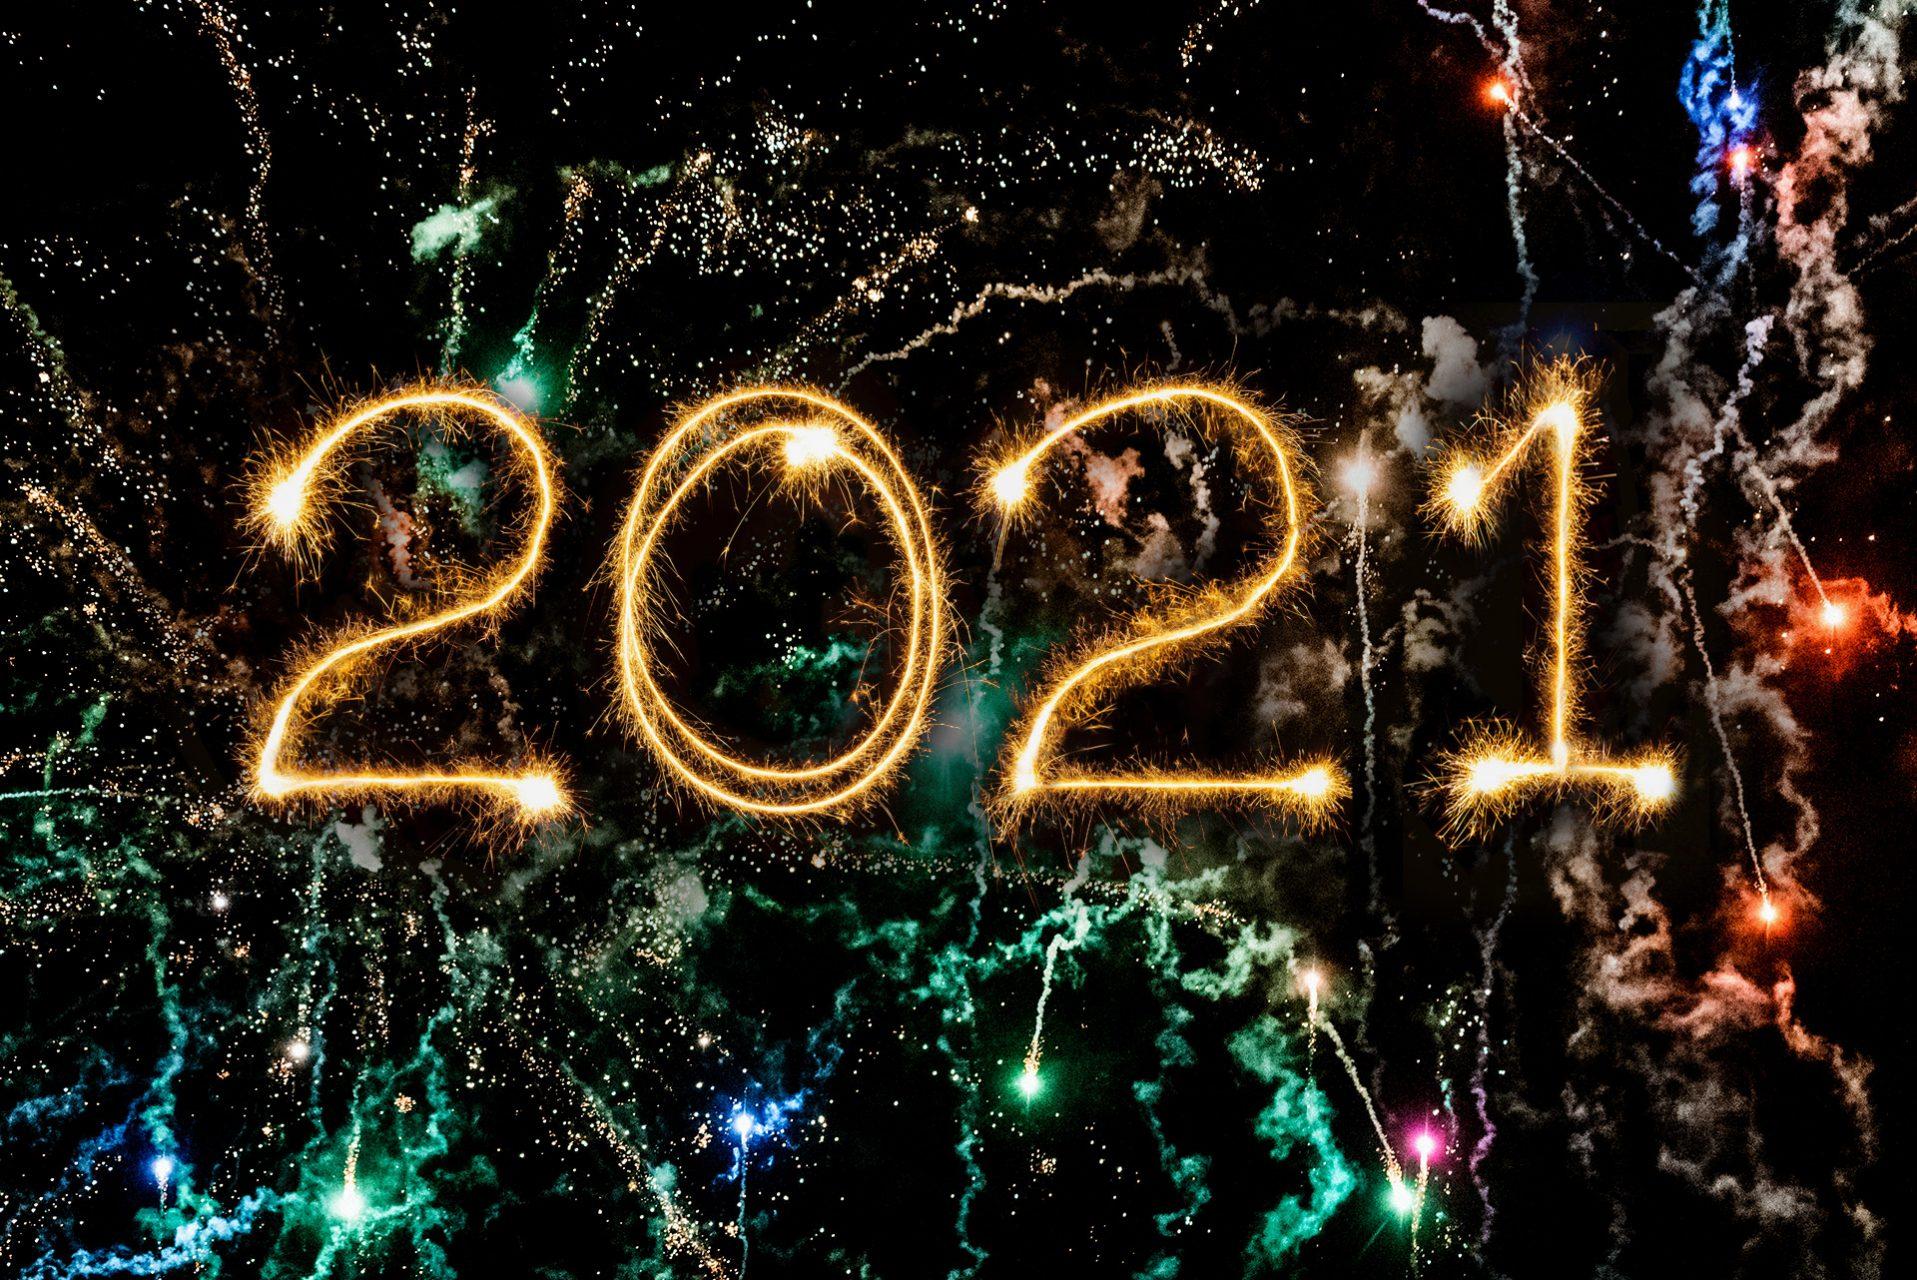 Neujahrs-Gruß - Leipziger Kinderstiftung - 2021